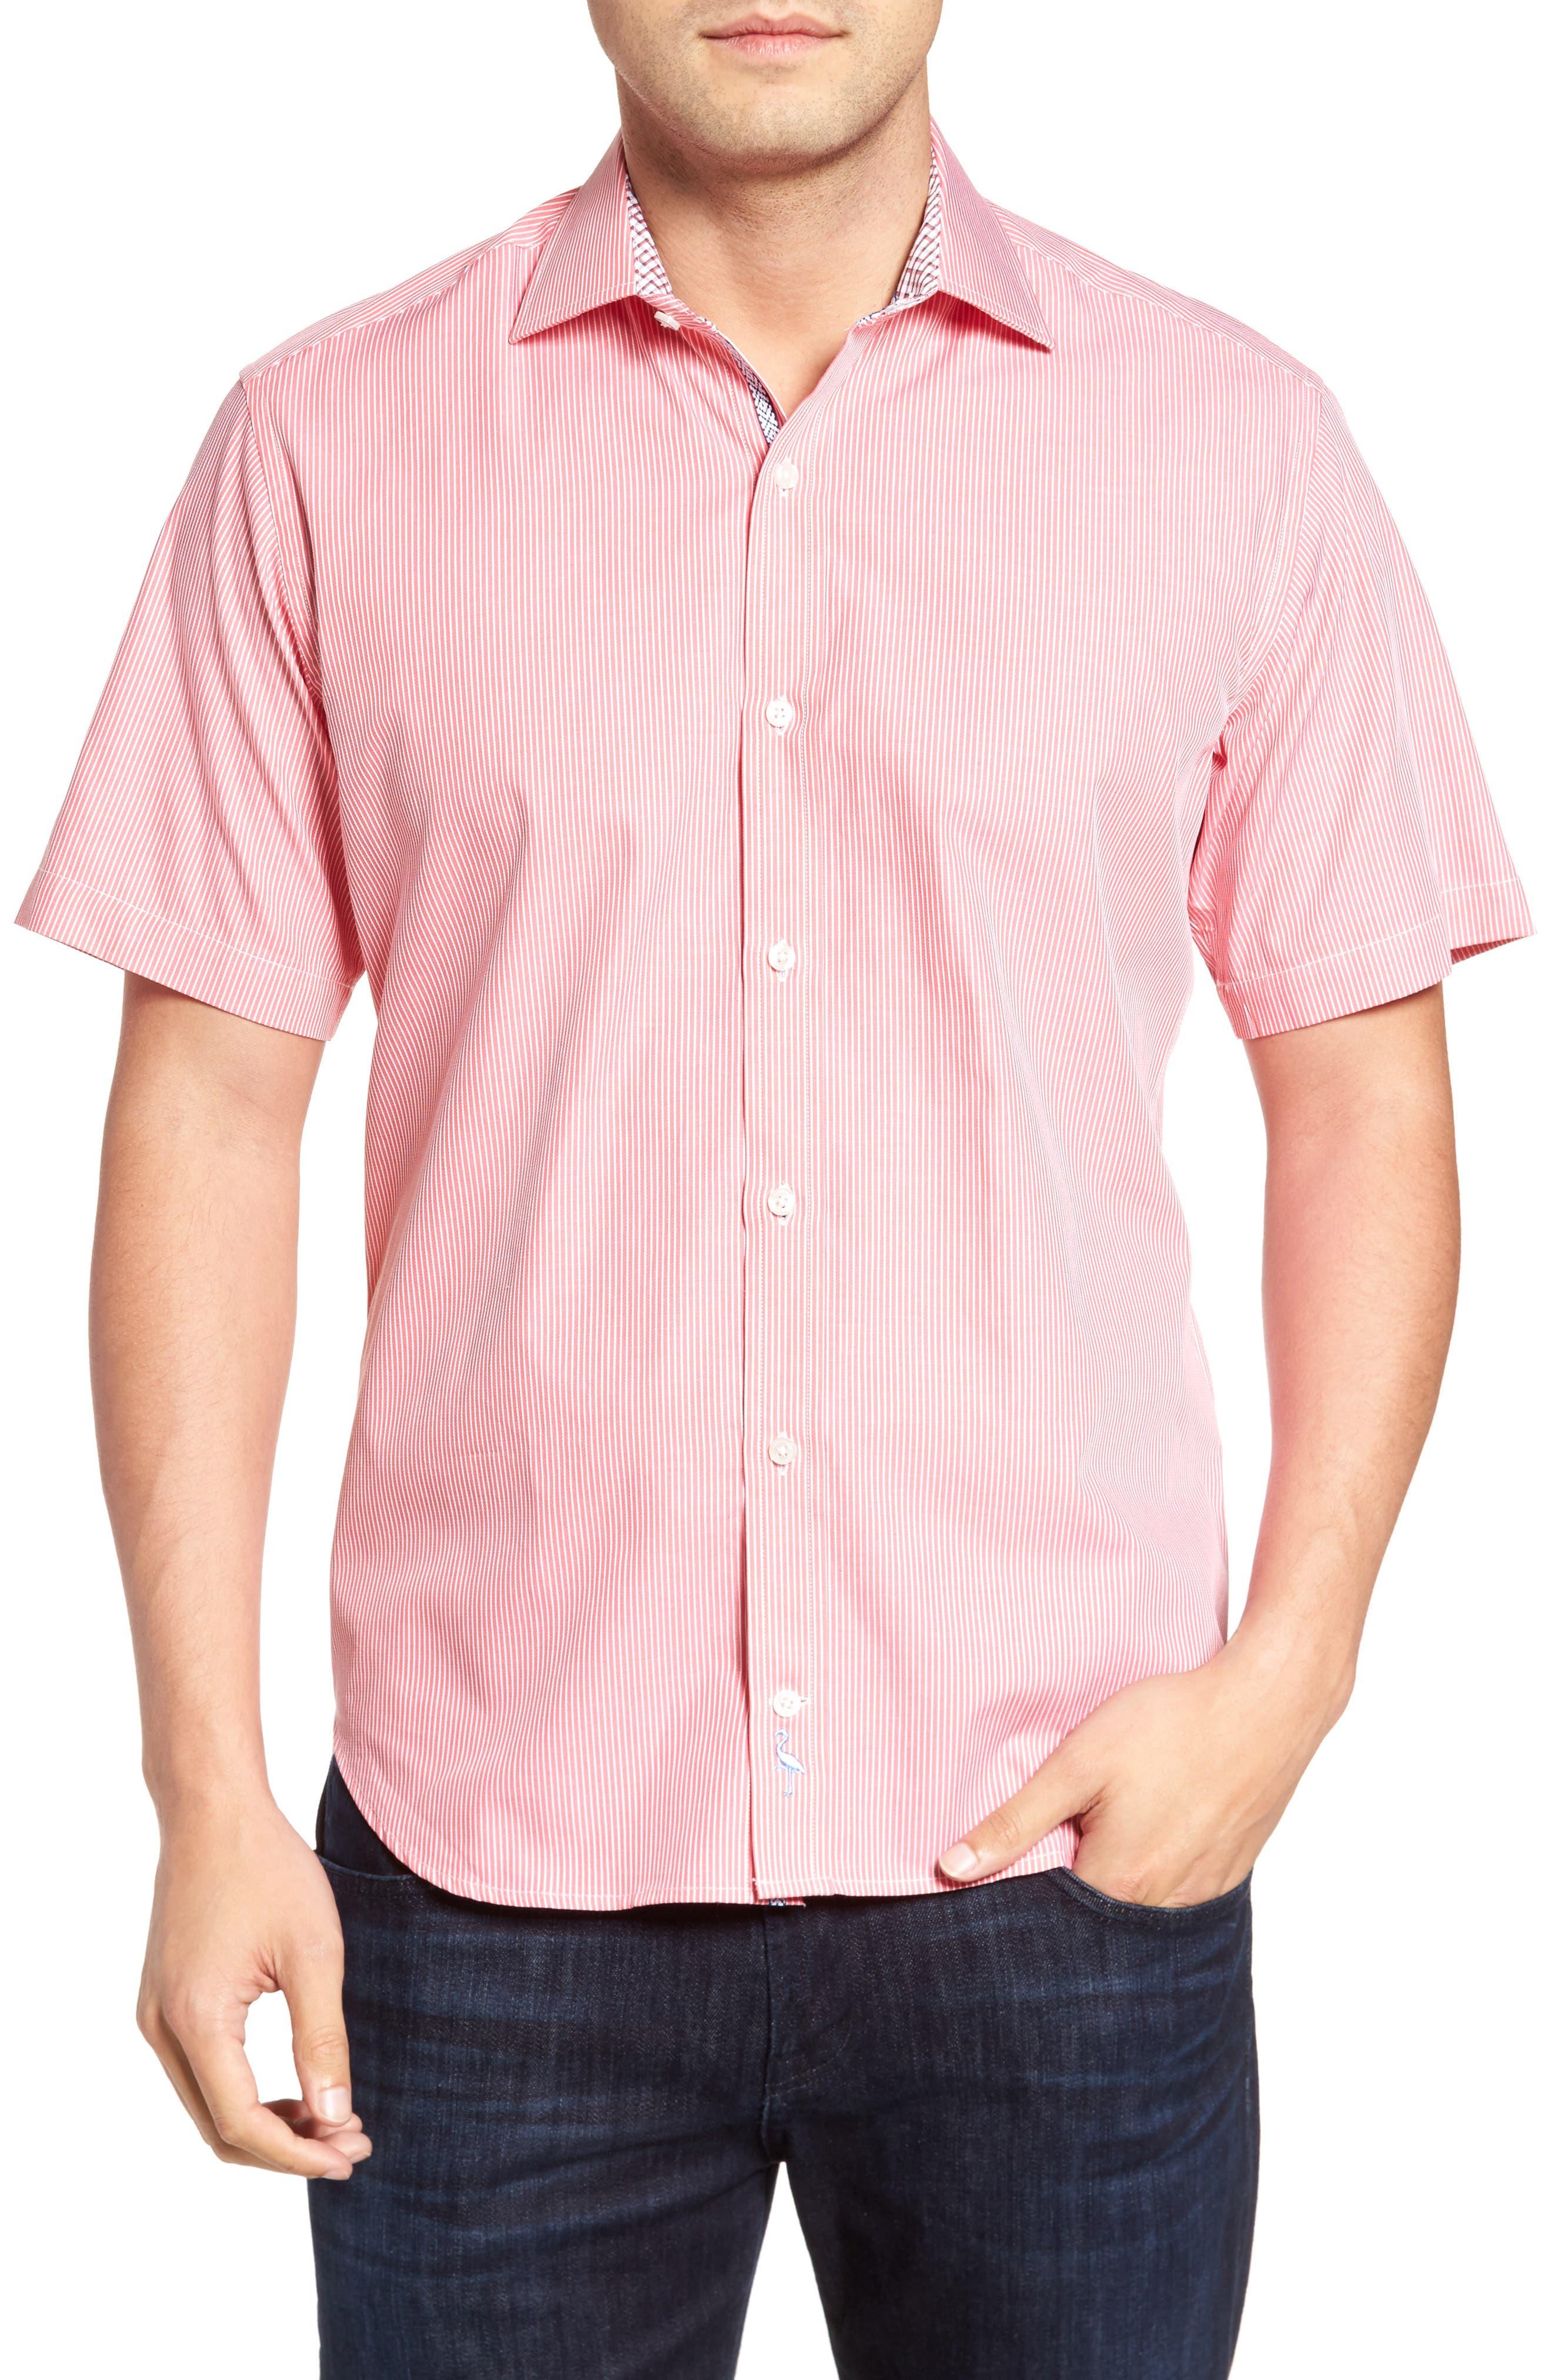 Main Image - TailorByrd Many Regular Fit Stripe Sport Shirt